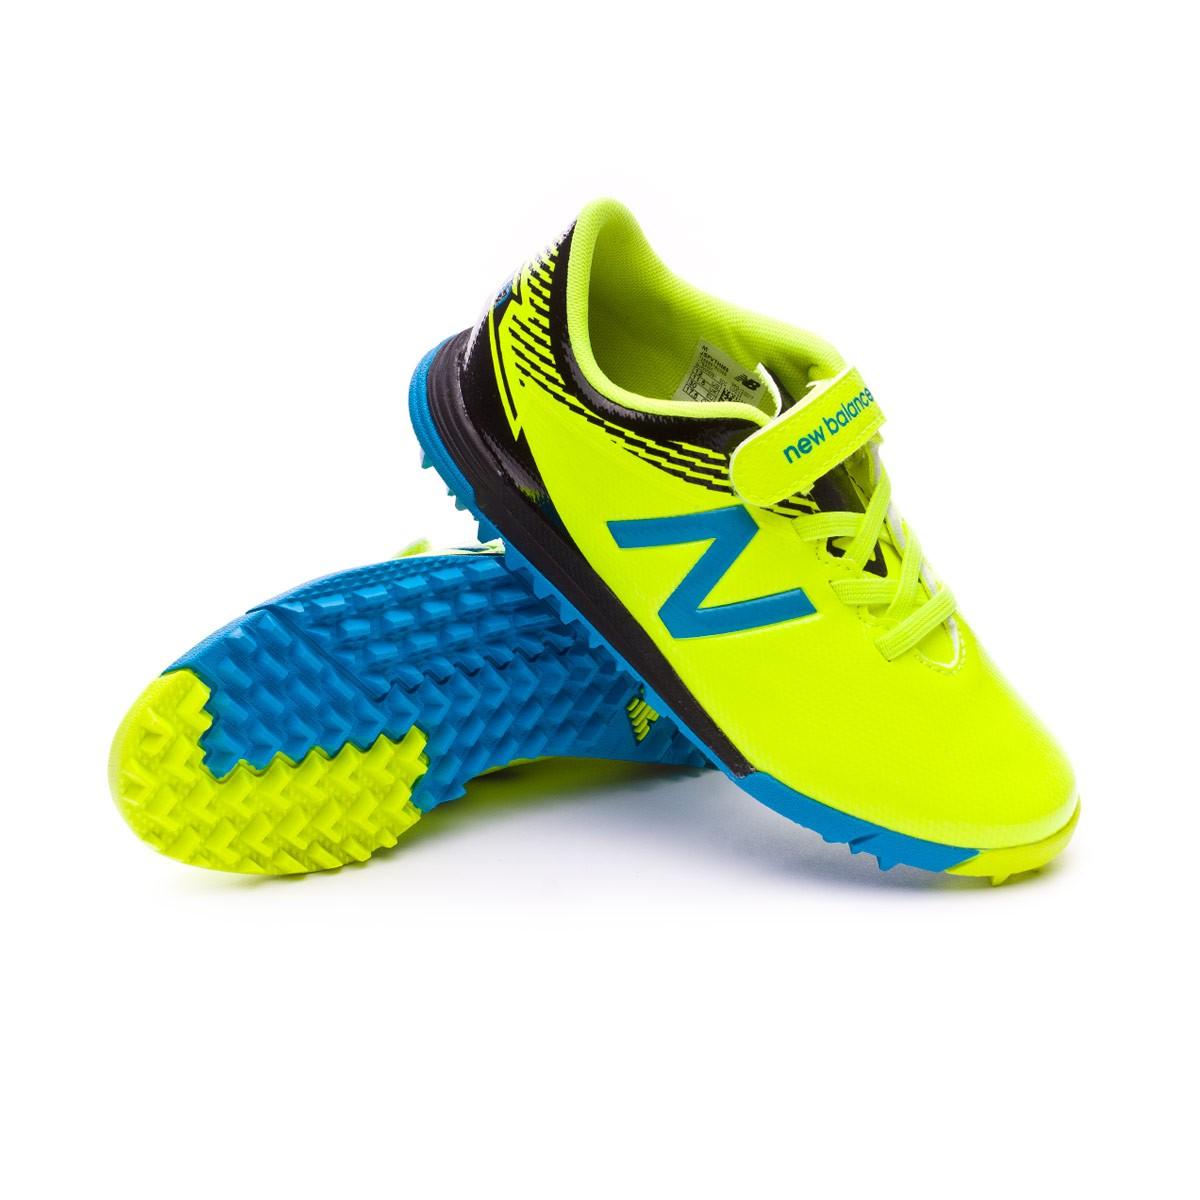 chaussure foot enfant new balance